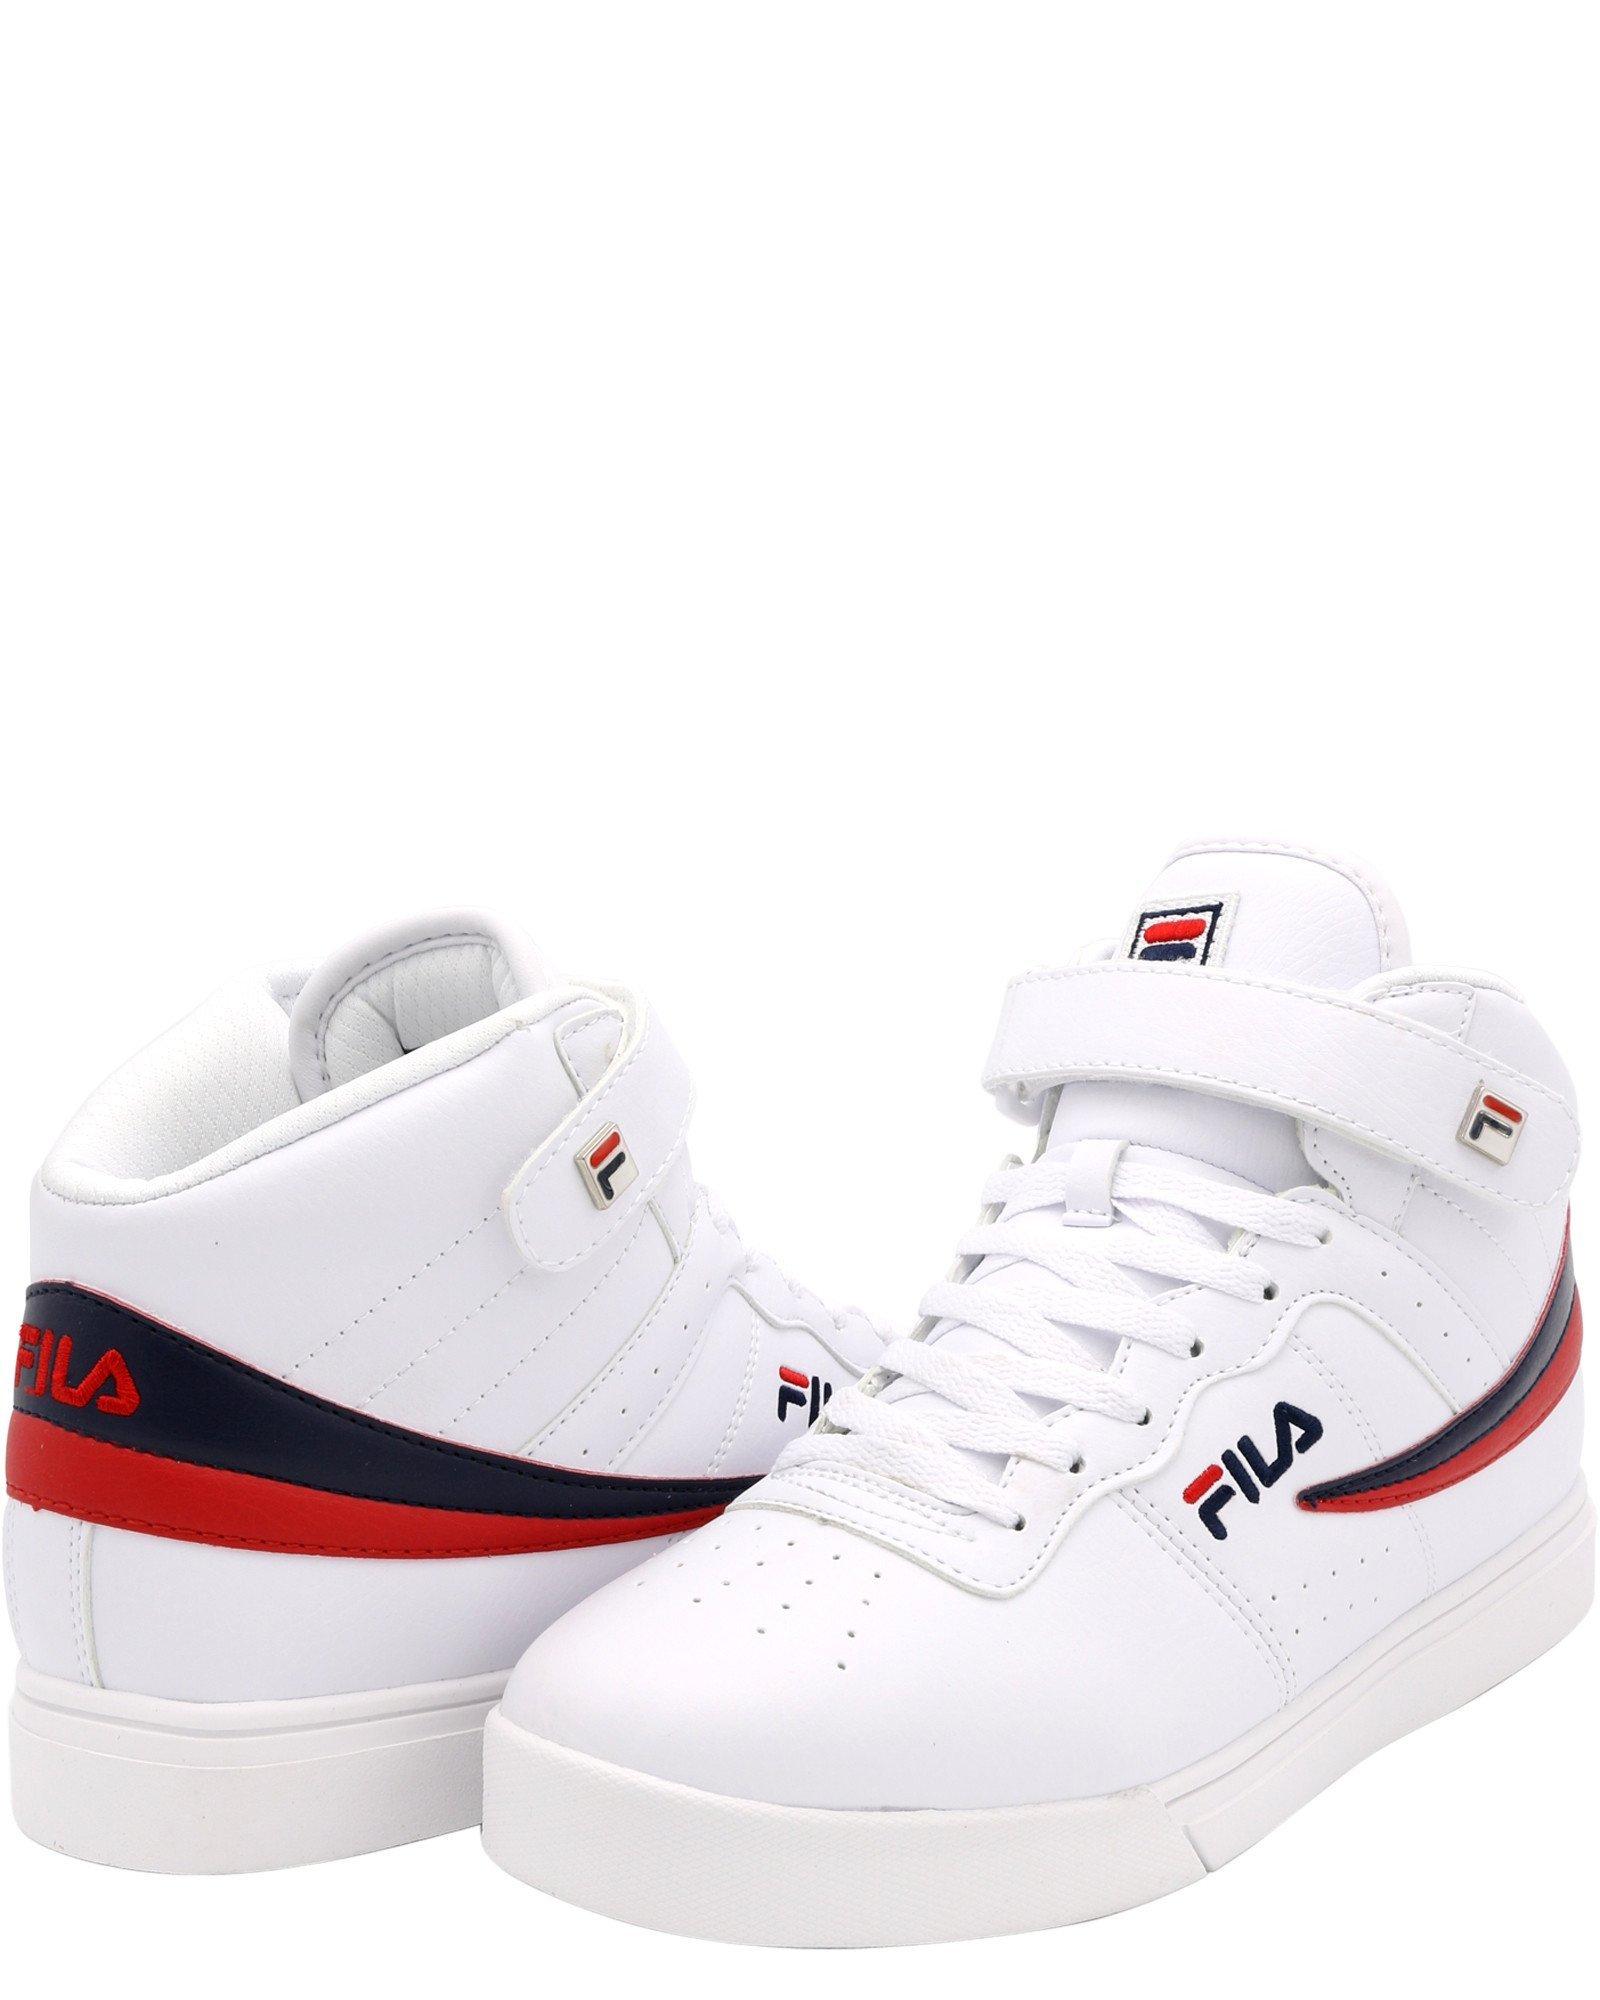 Fila Men's Vulc 13 MID Plus 2 Walking Shoe, White Navy red 150, 7 D US